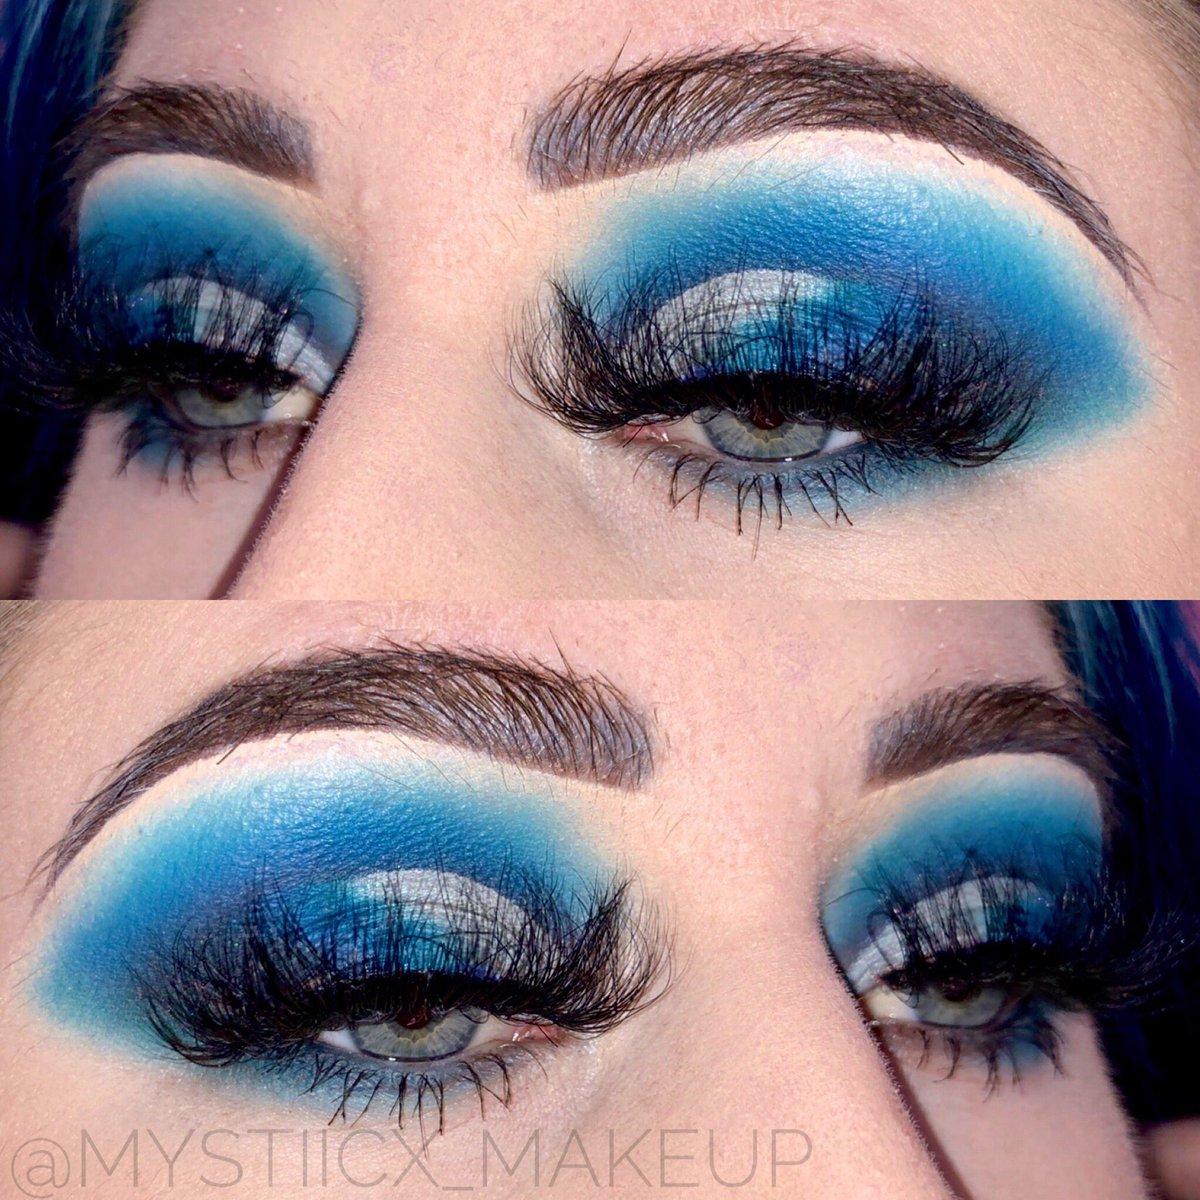 Hey @MorpheBrushes @jamescharles #colorfulmakeup #makeup #lashes #morphebrushespic.twitter.com/IvL2PvUJXD